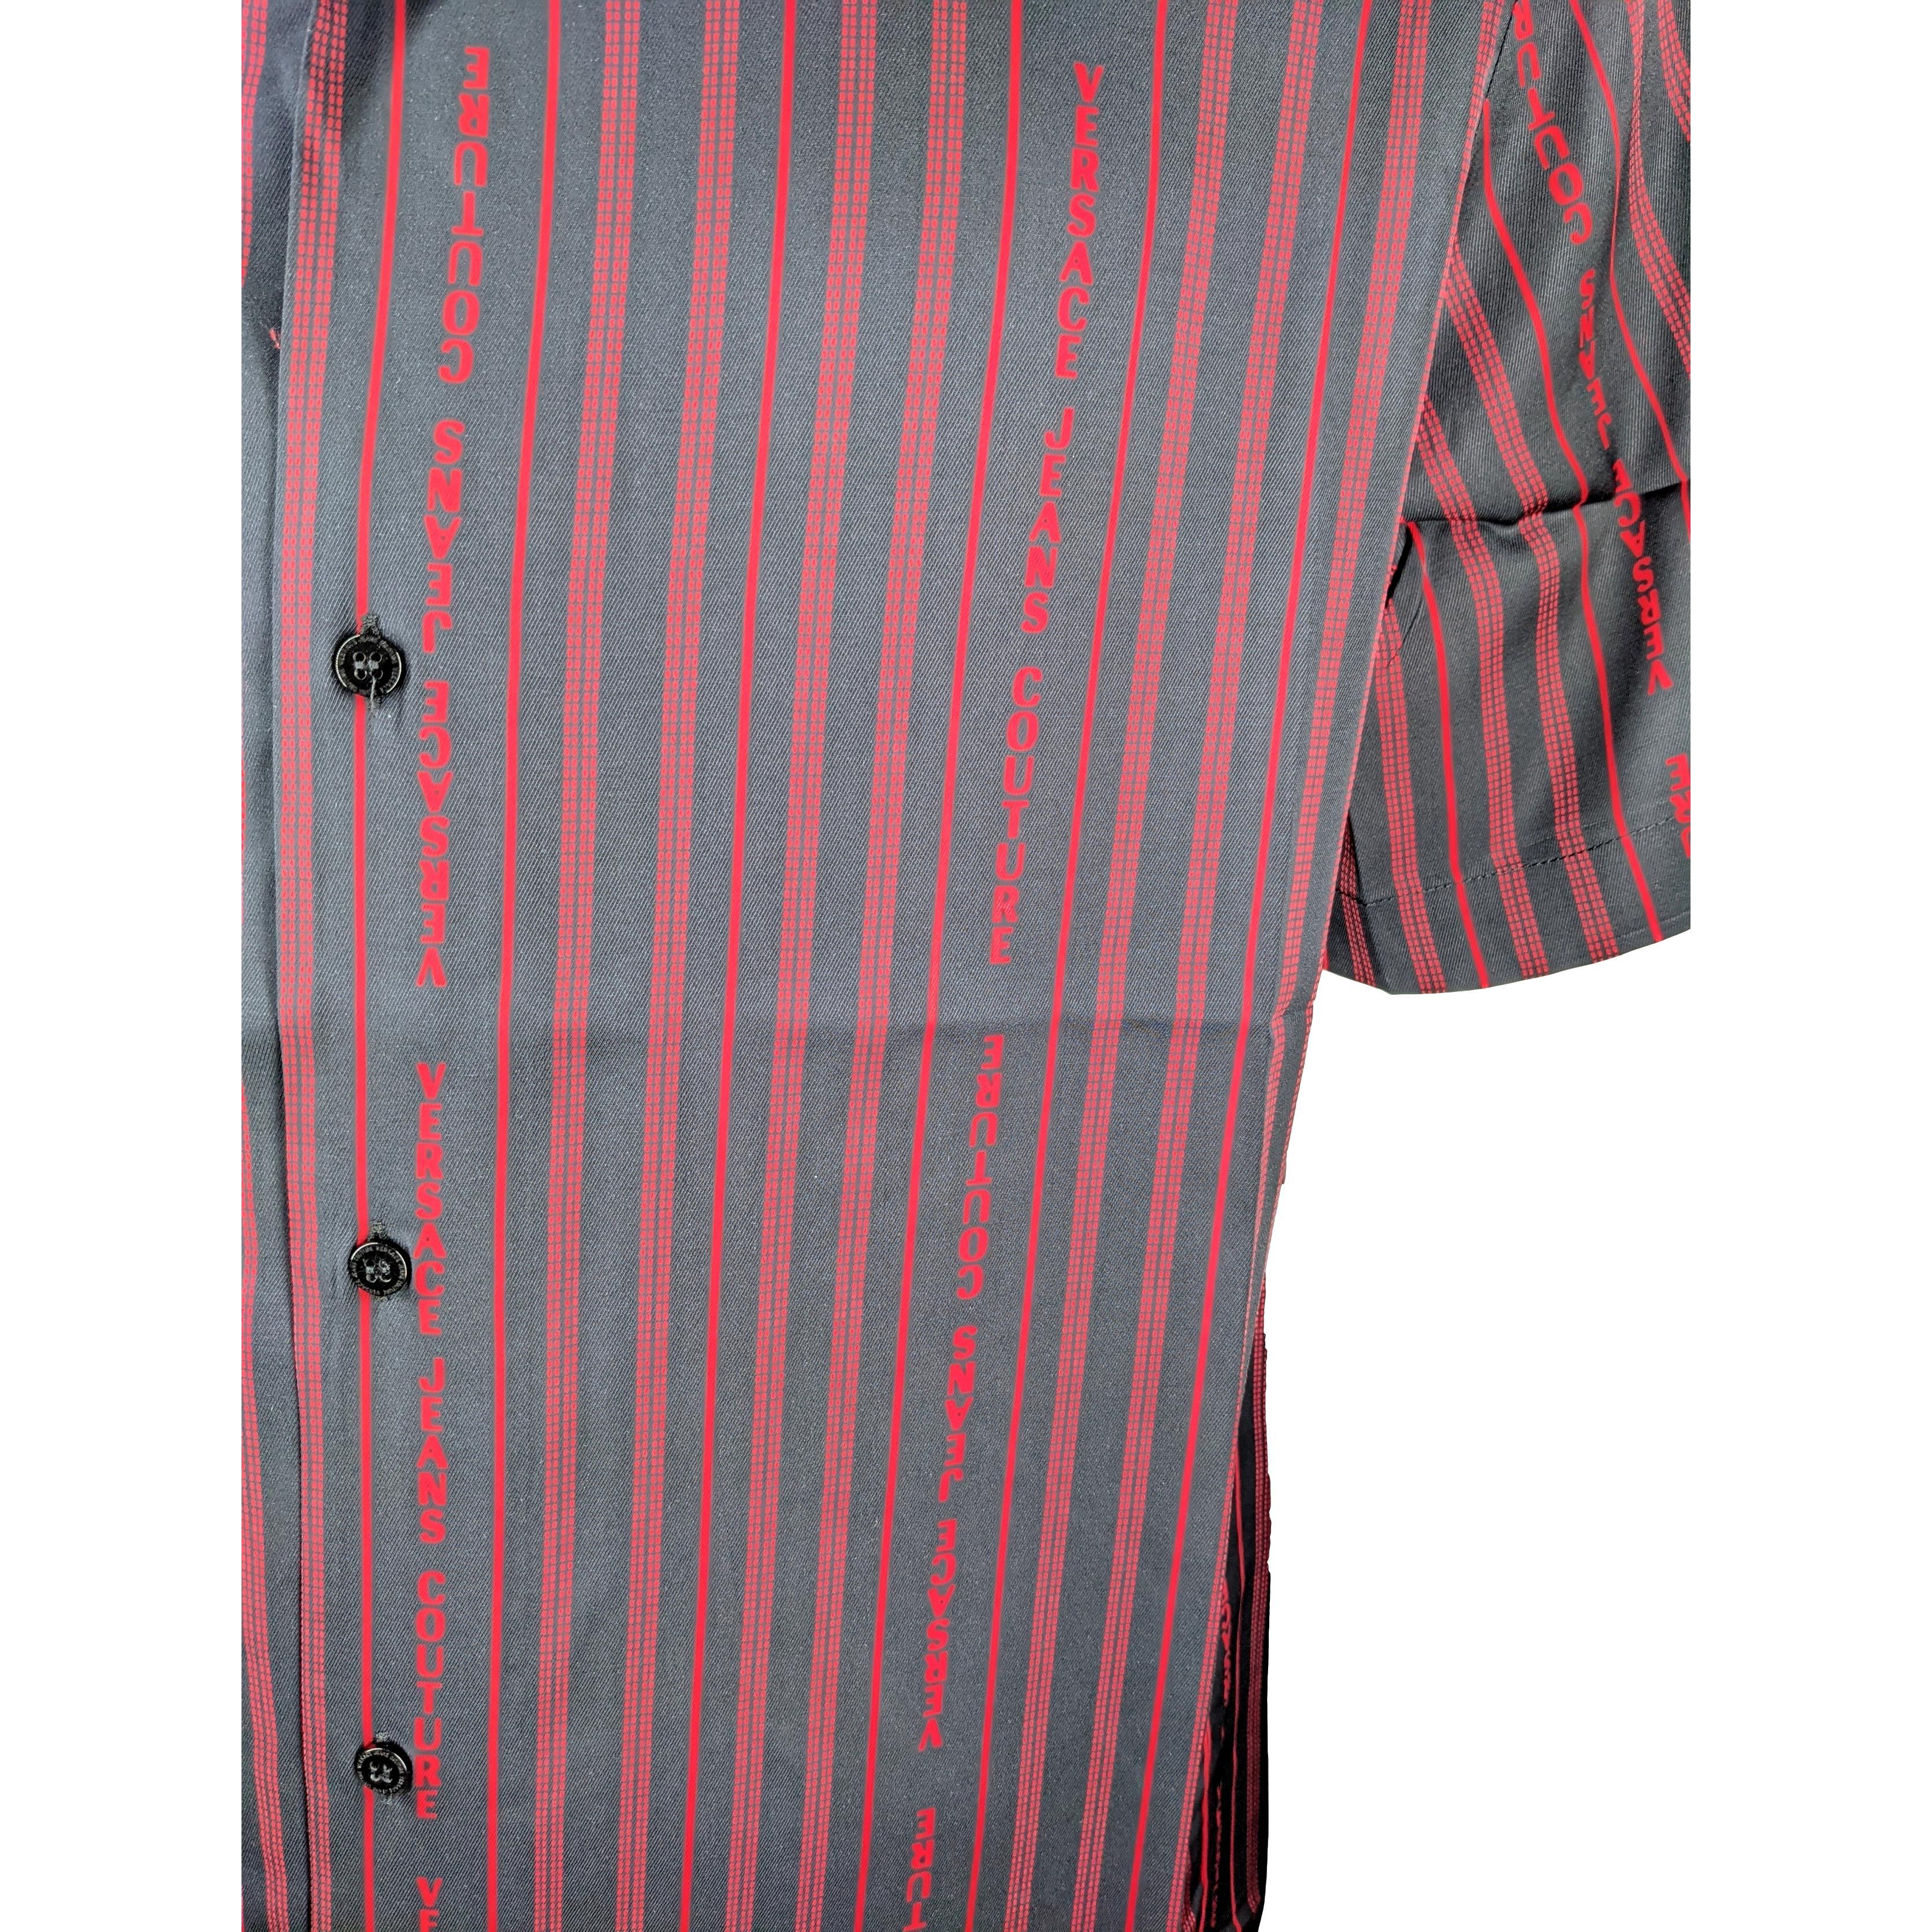 striped logo short-sleeved shirt VERSACE JEANS COUTURE      B1GWA6B1 S0985899